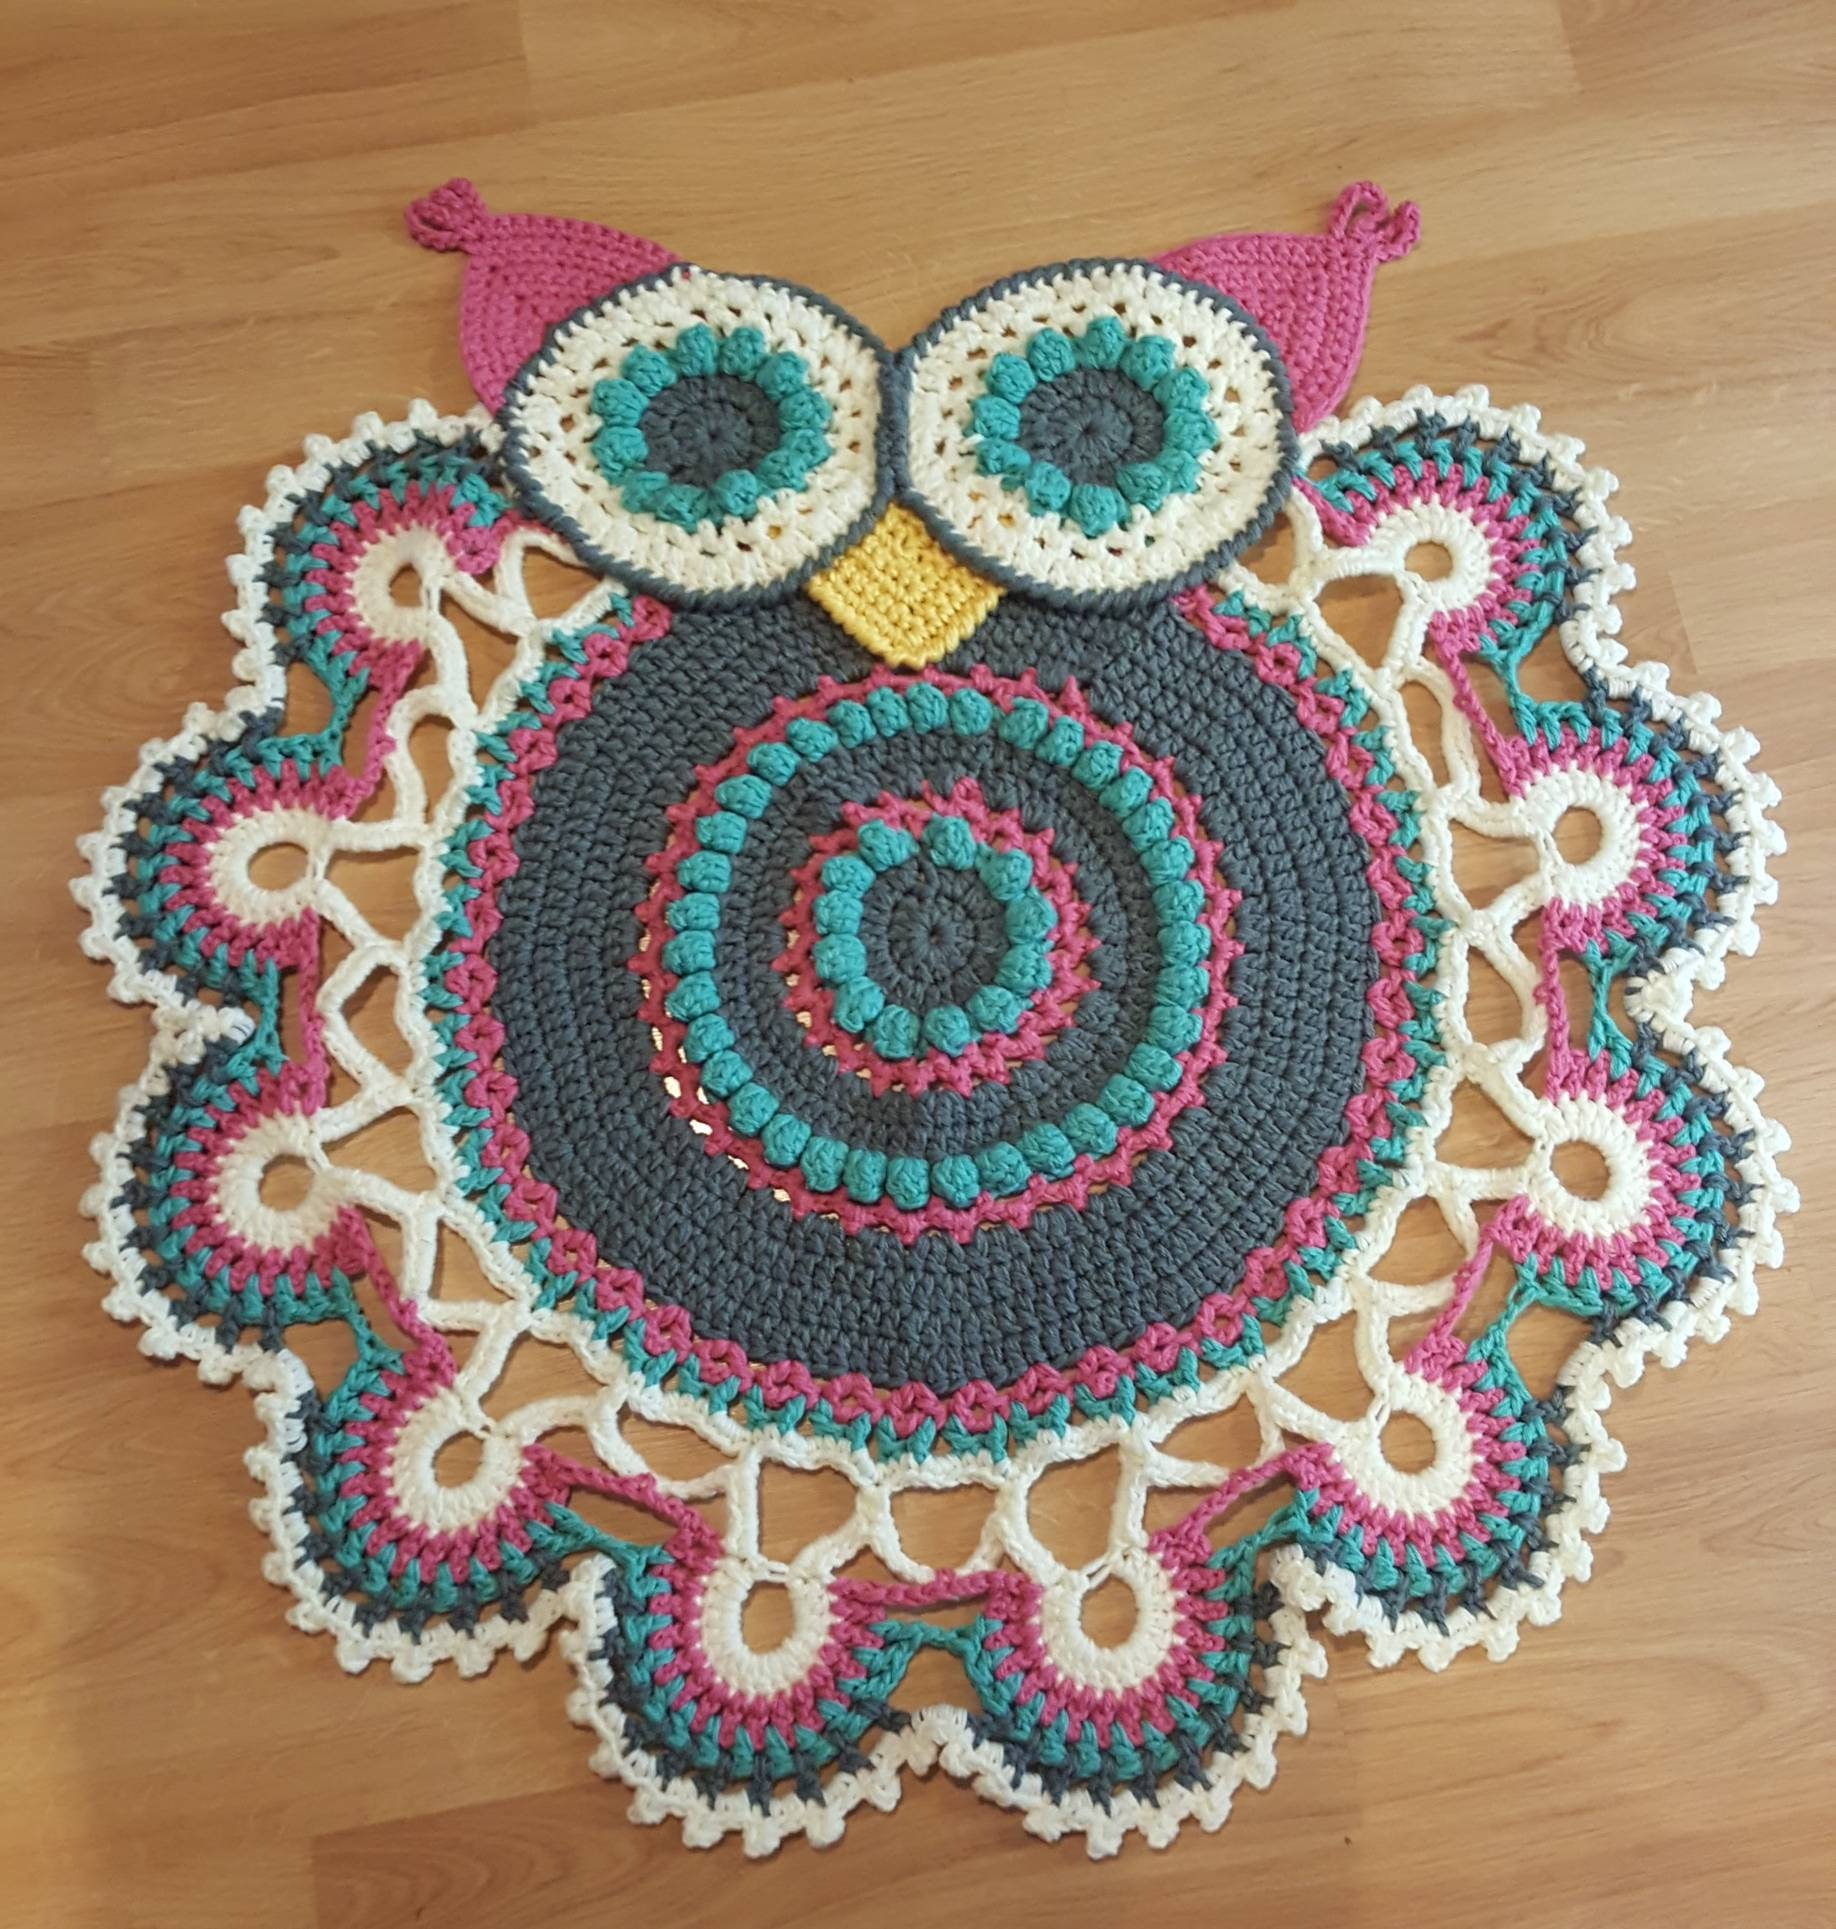 Crochet Owl Rug Pattern: Custom Handmade Crochet Owl Rug Baby Nursery Mat